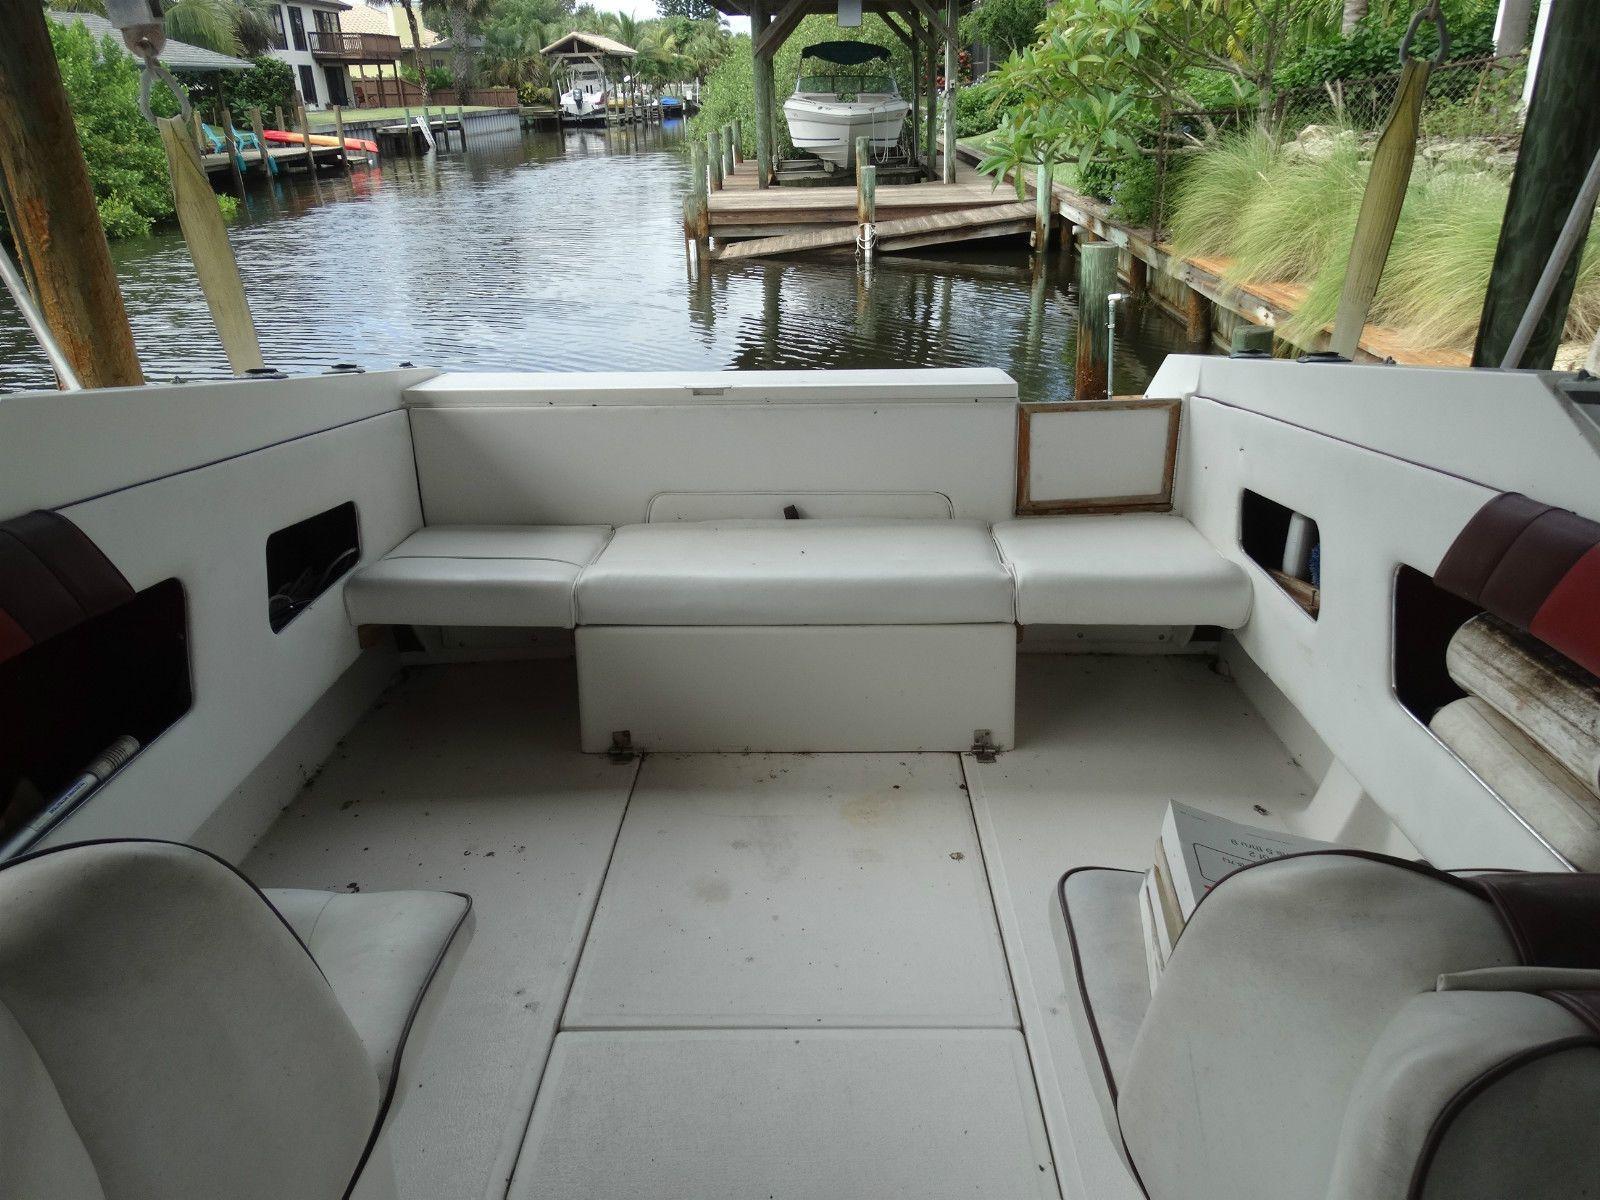 Ebay Boats Florida >> 1989 Sea Ray 220cc 23 8 Cuddy Cabin Florida Ebay Fishing Boat